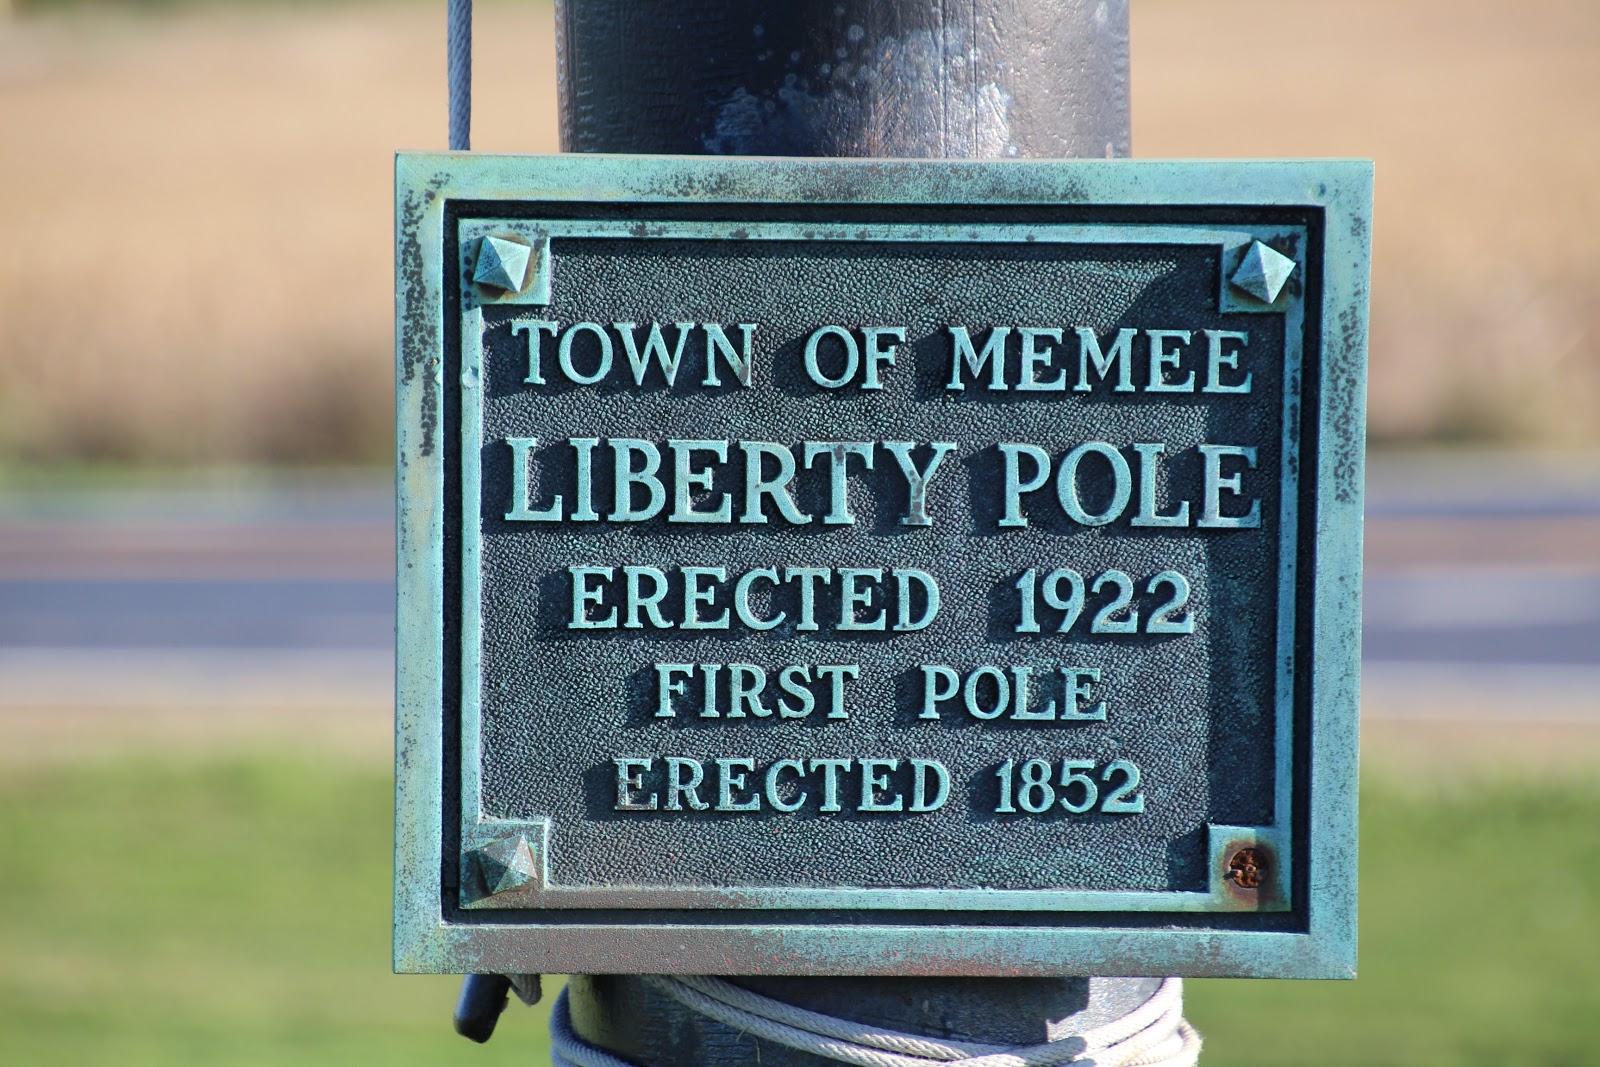 The Liberty Pole